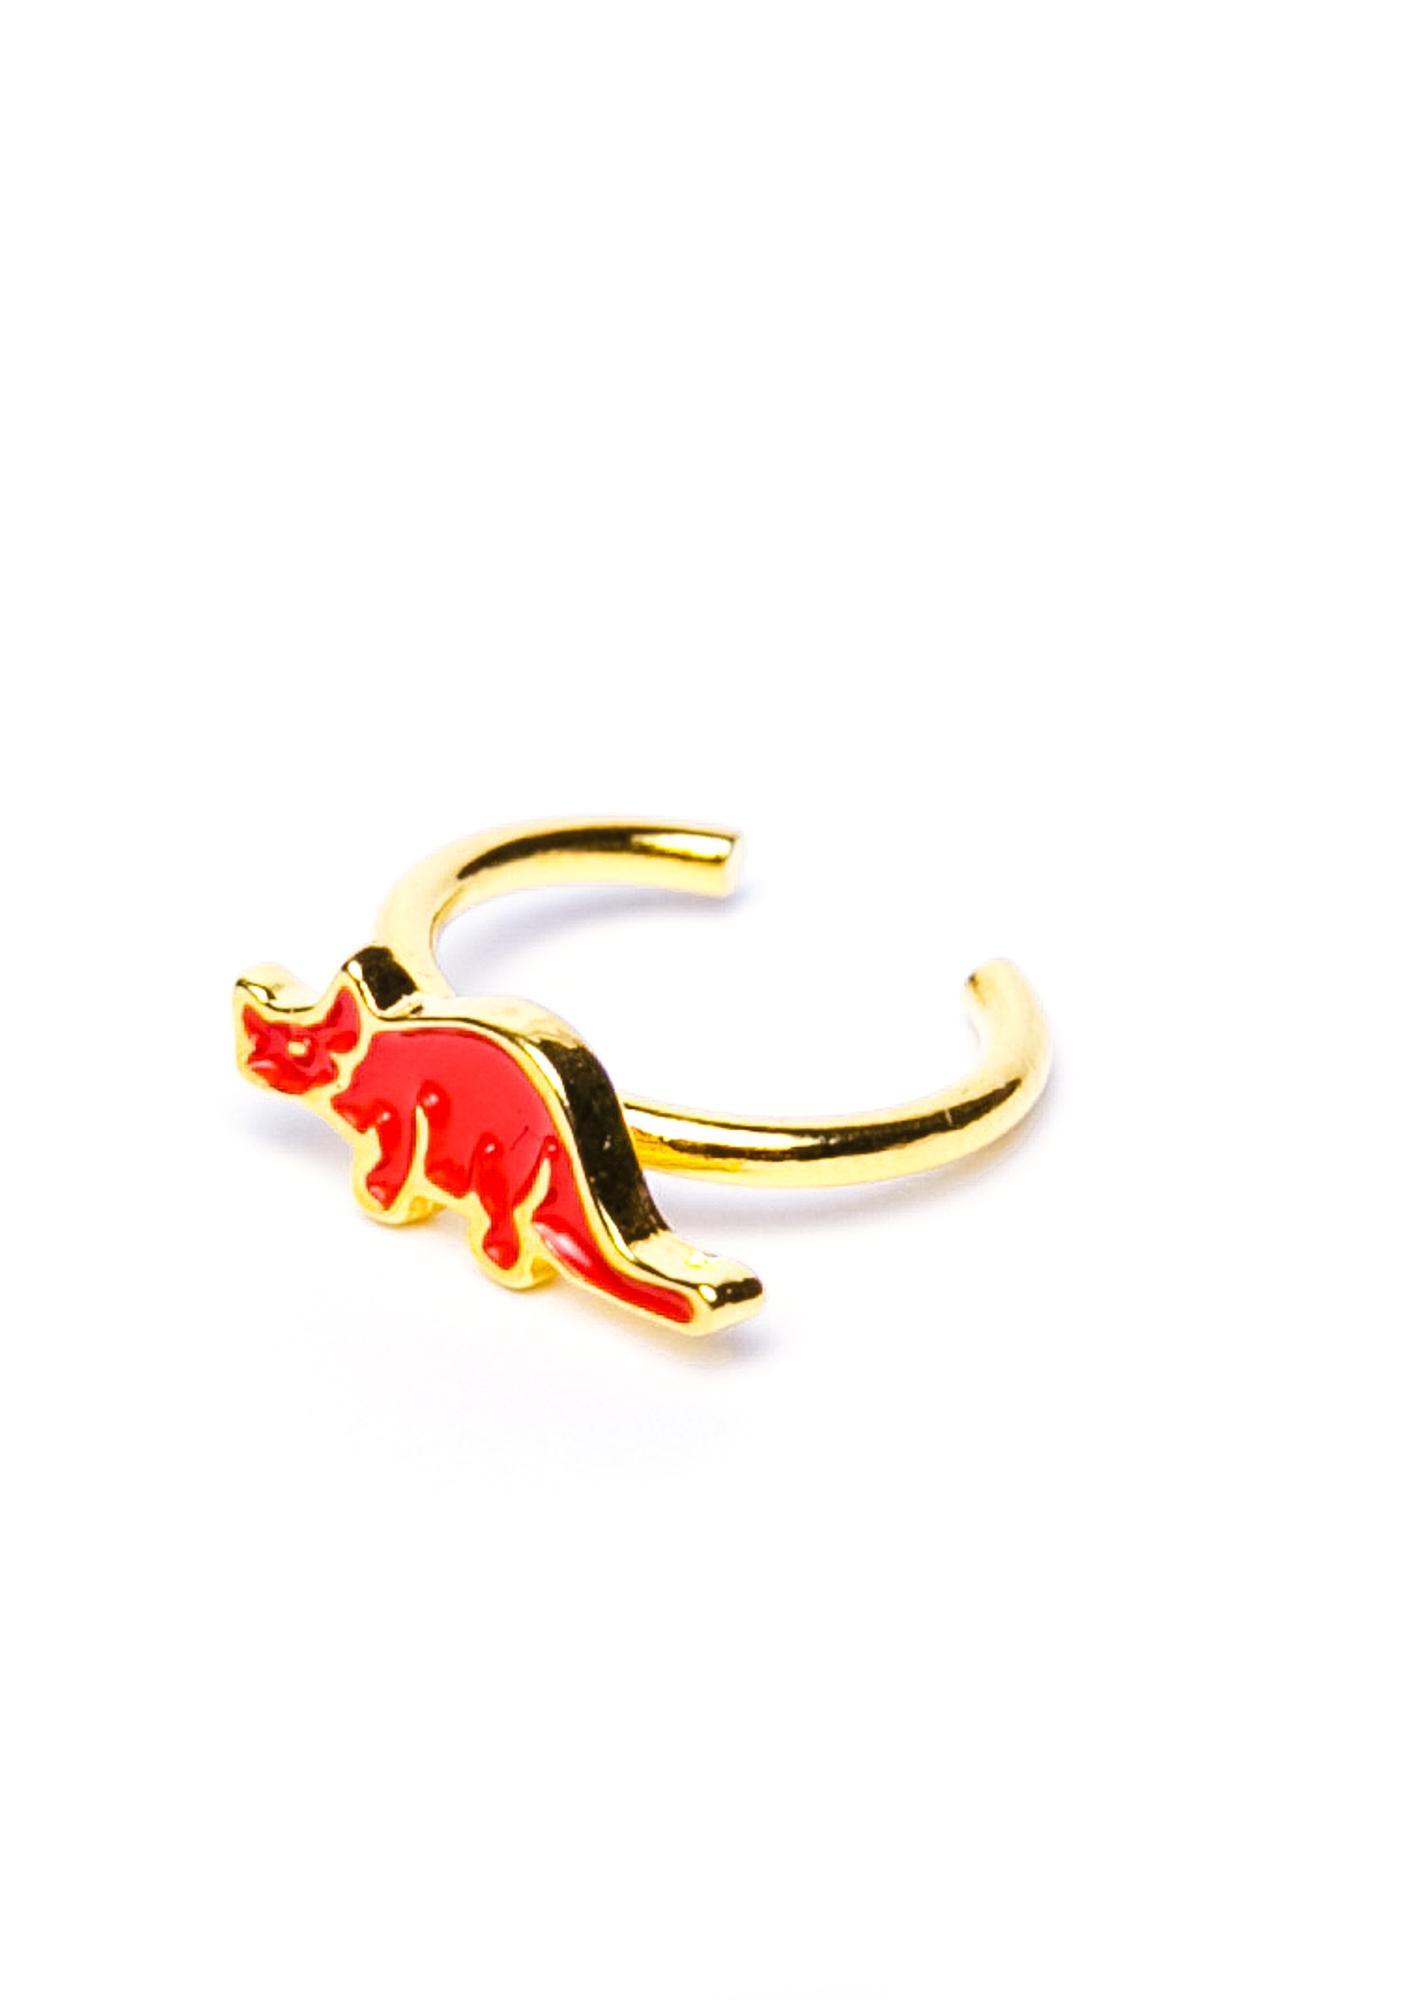 Joyrich x Giza Dinosaur Triceratops Micro Fingertip Ring